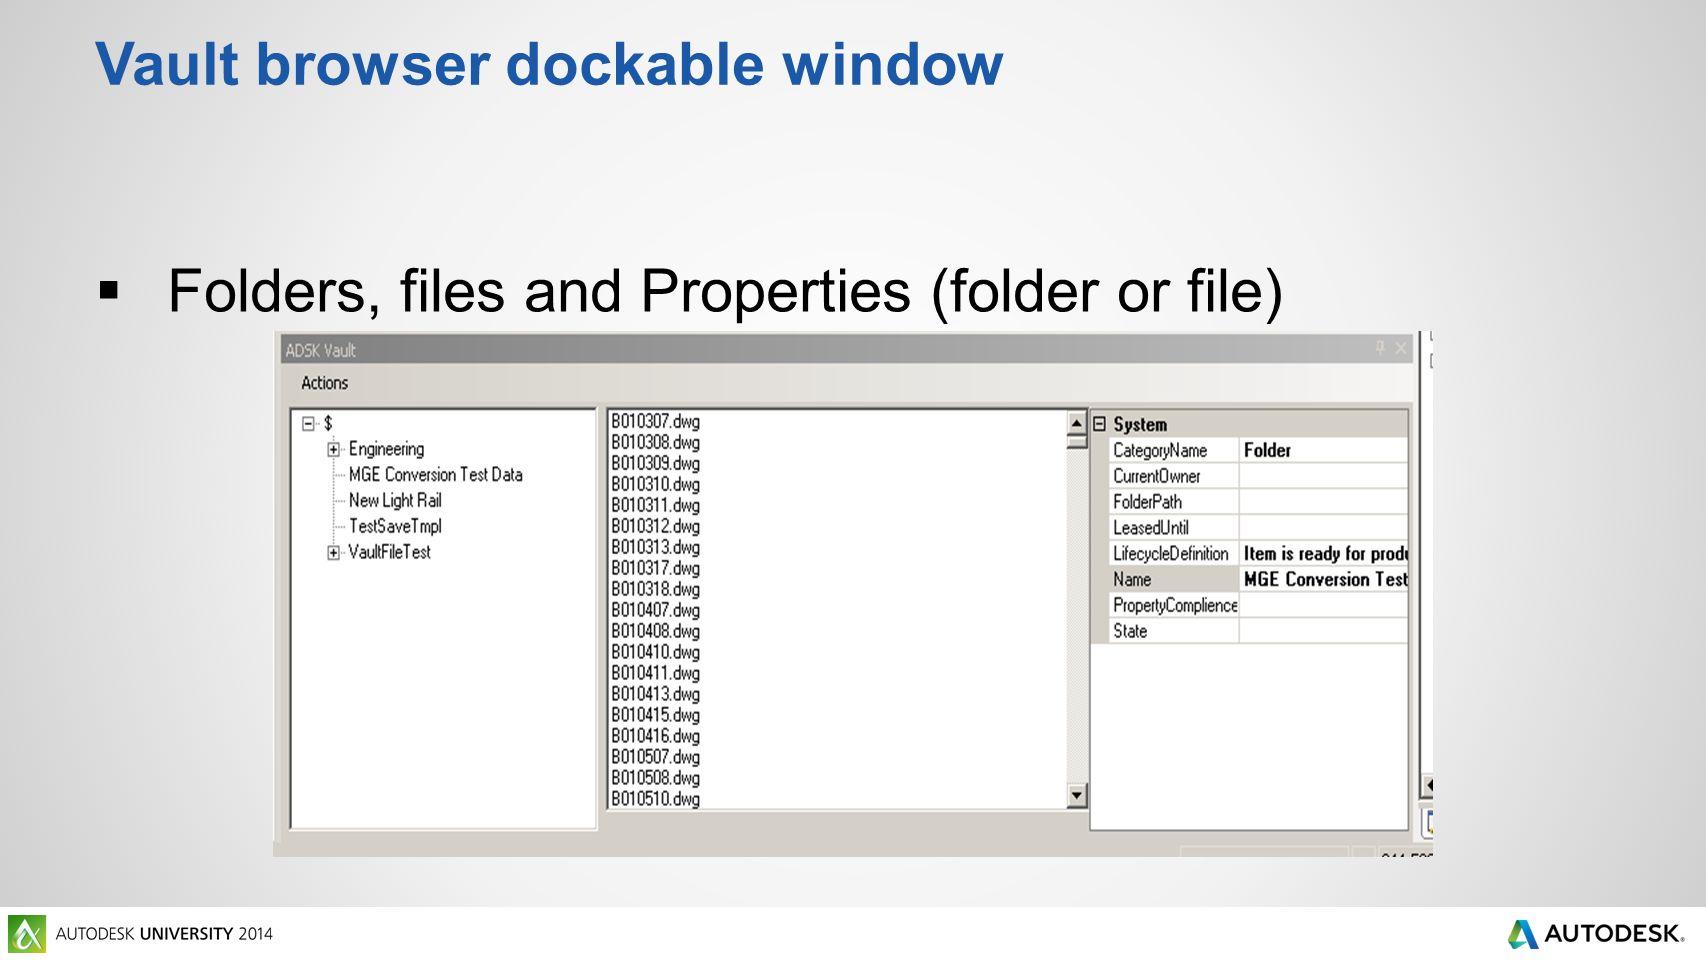 Vault browser dockable window  Folders, files and Properties (folder or file)